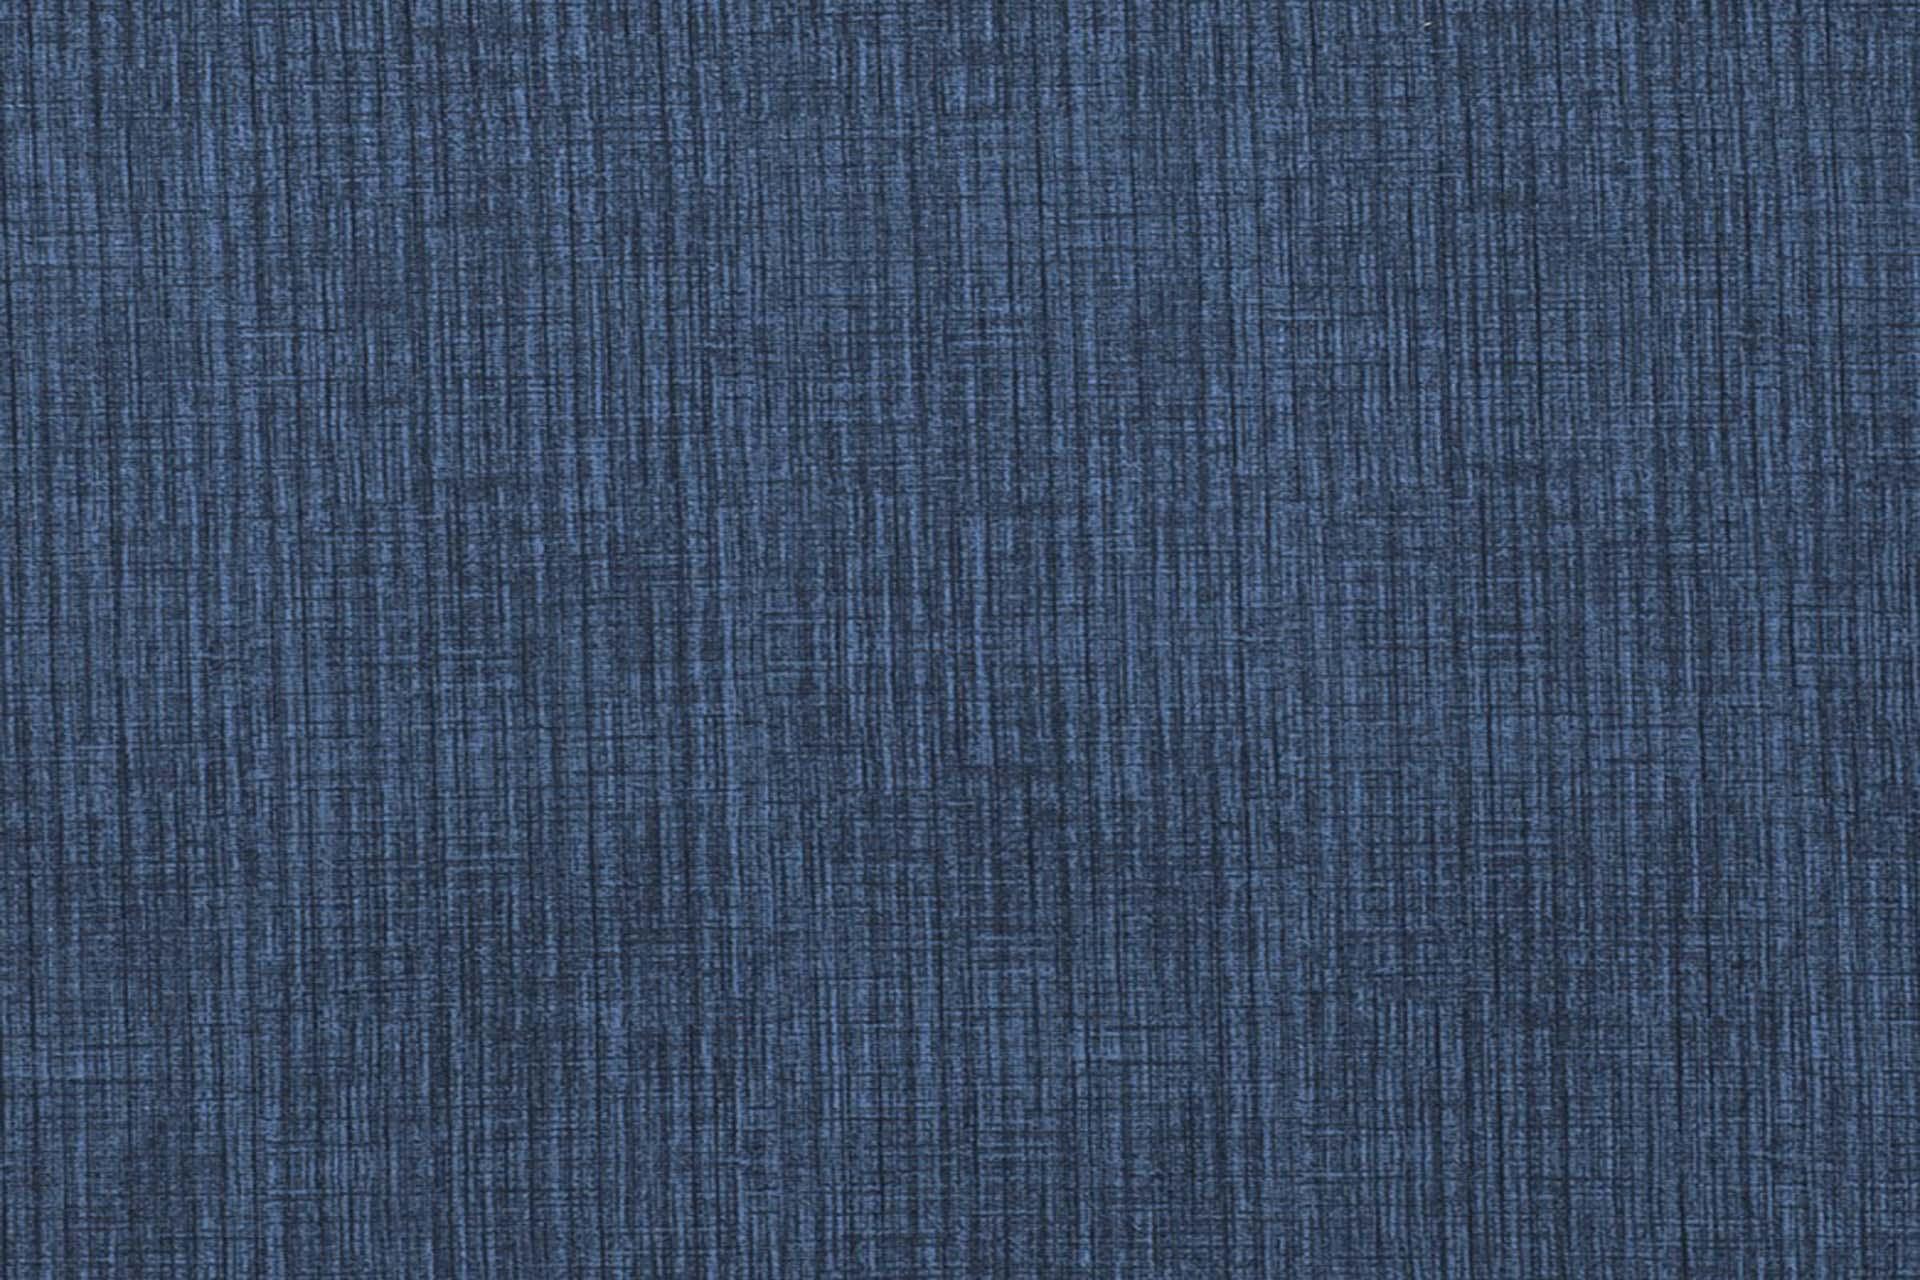 Tissu ameublement nantes elegant ameublement nantes tissu ameublement nantes mondial tissus - Tissu ameublement nantes ...